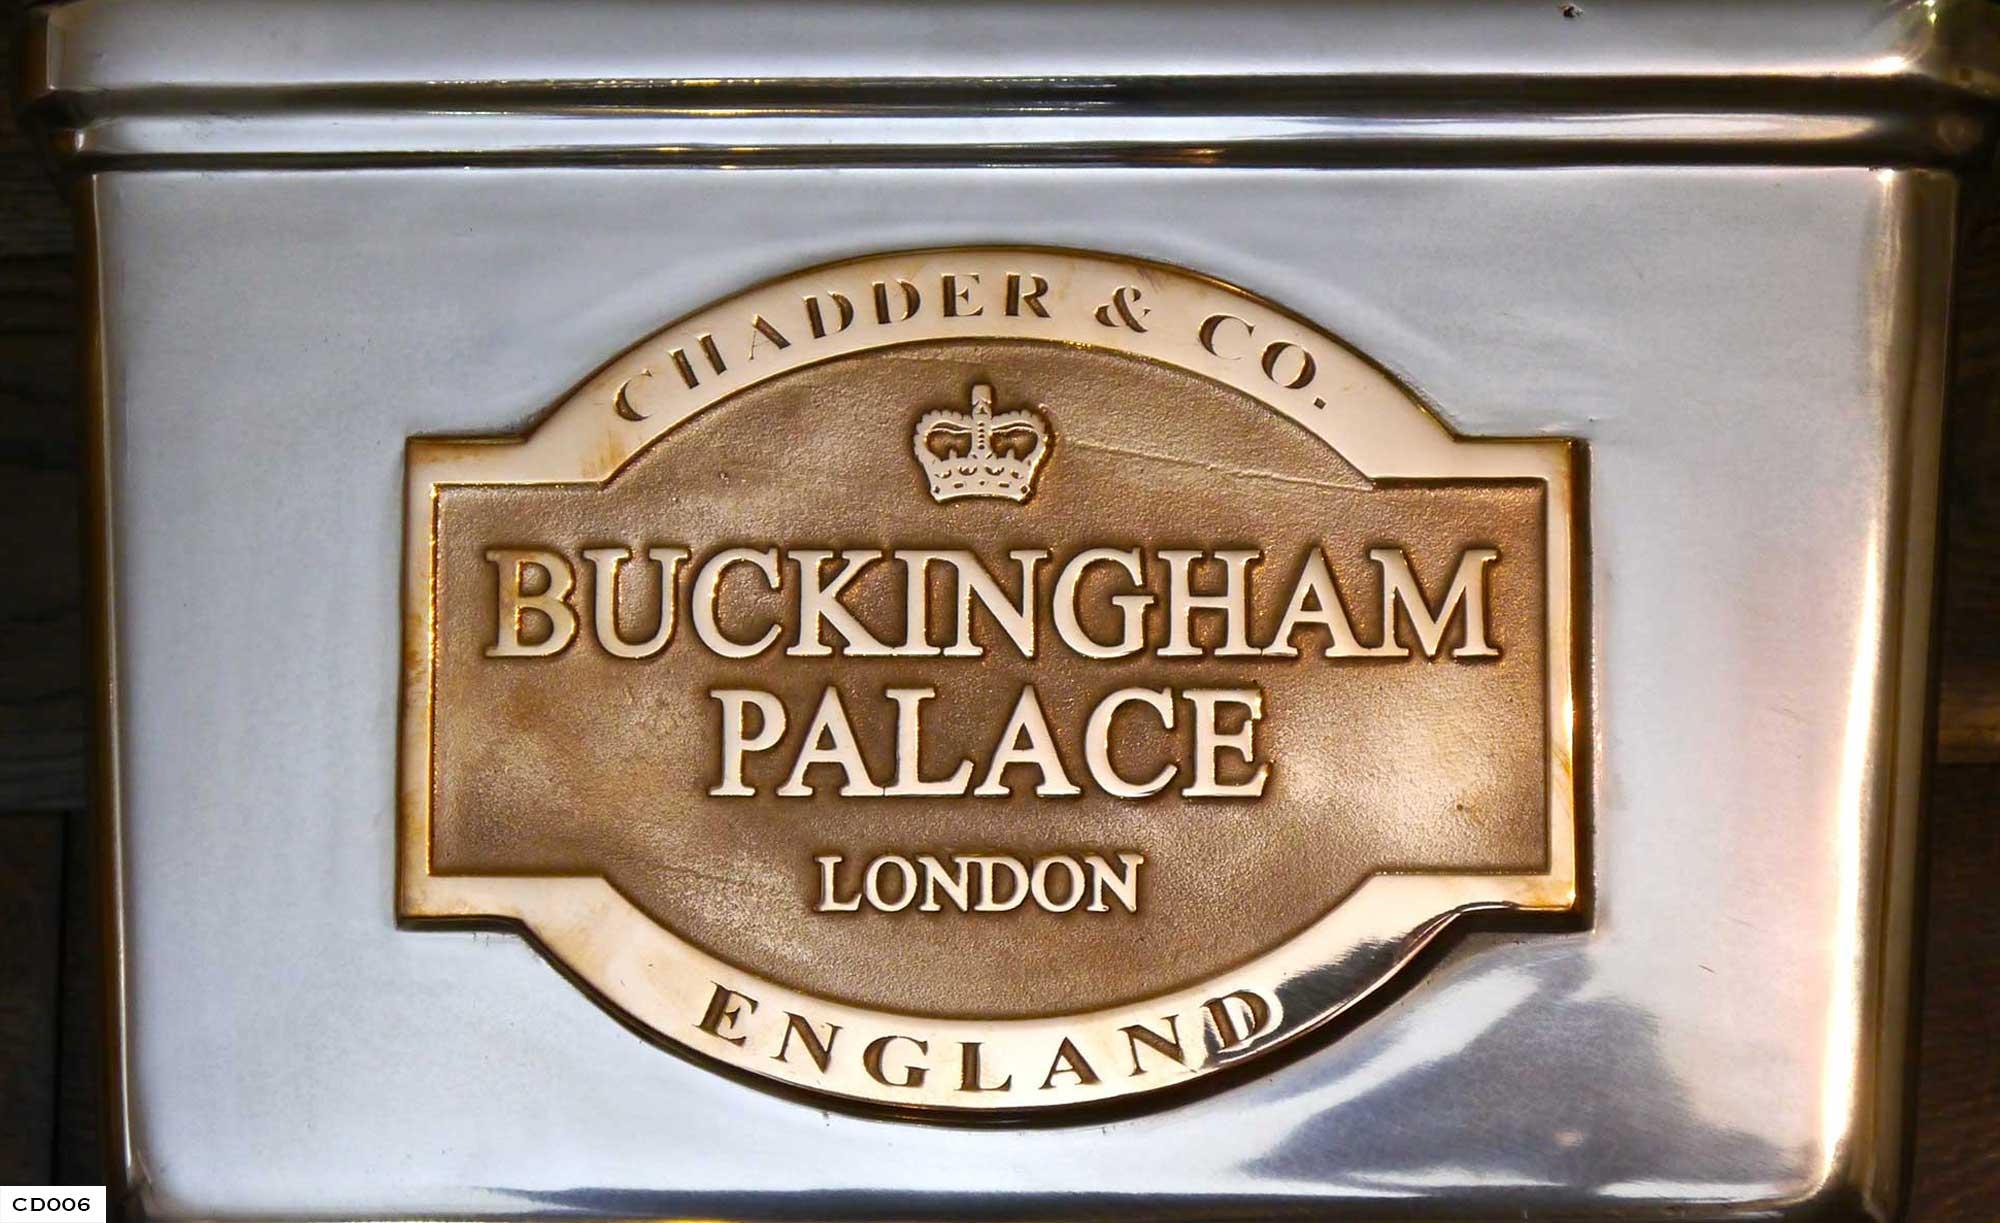 Buckingham Palace Toilet, Bespoke Cisterns, Chadder Design, Bespoke Toilet Cisterns